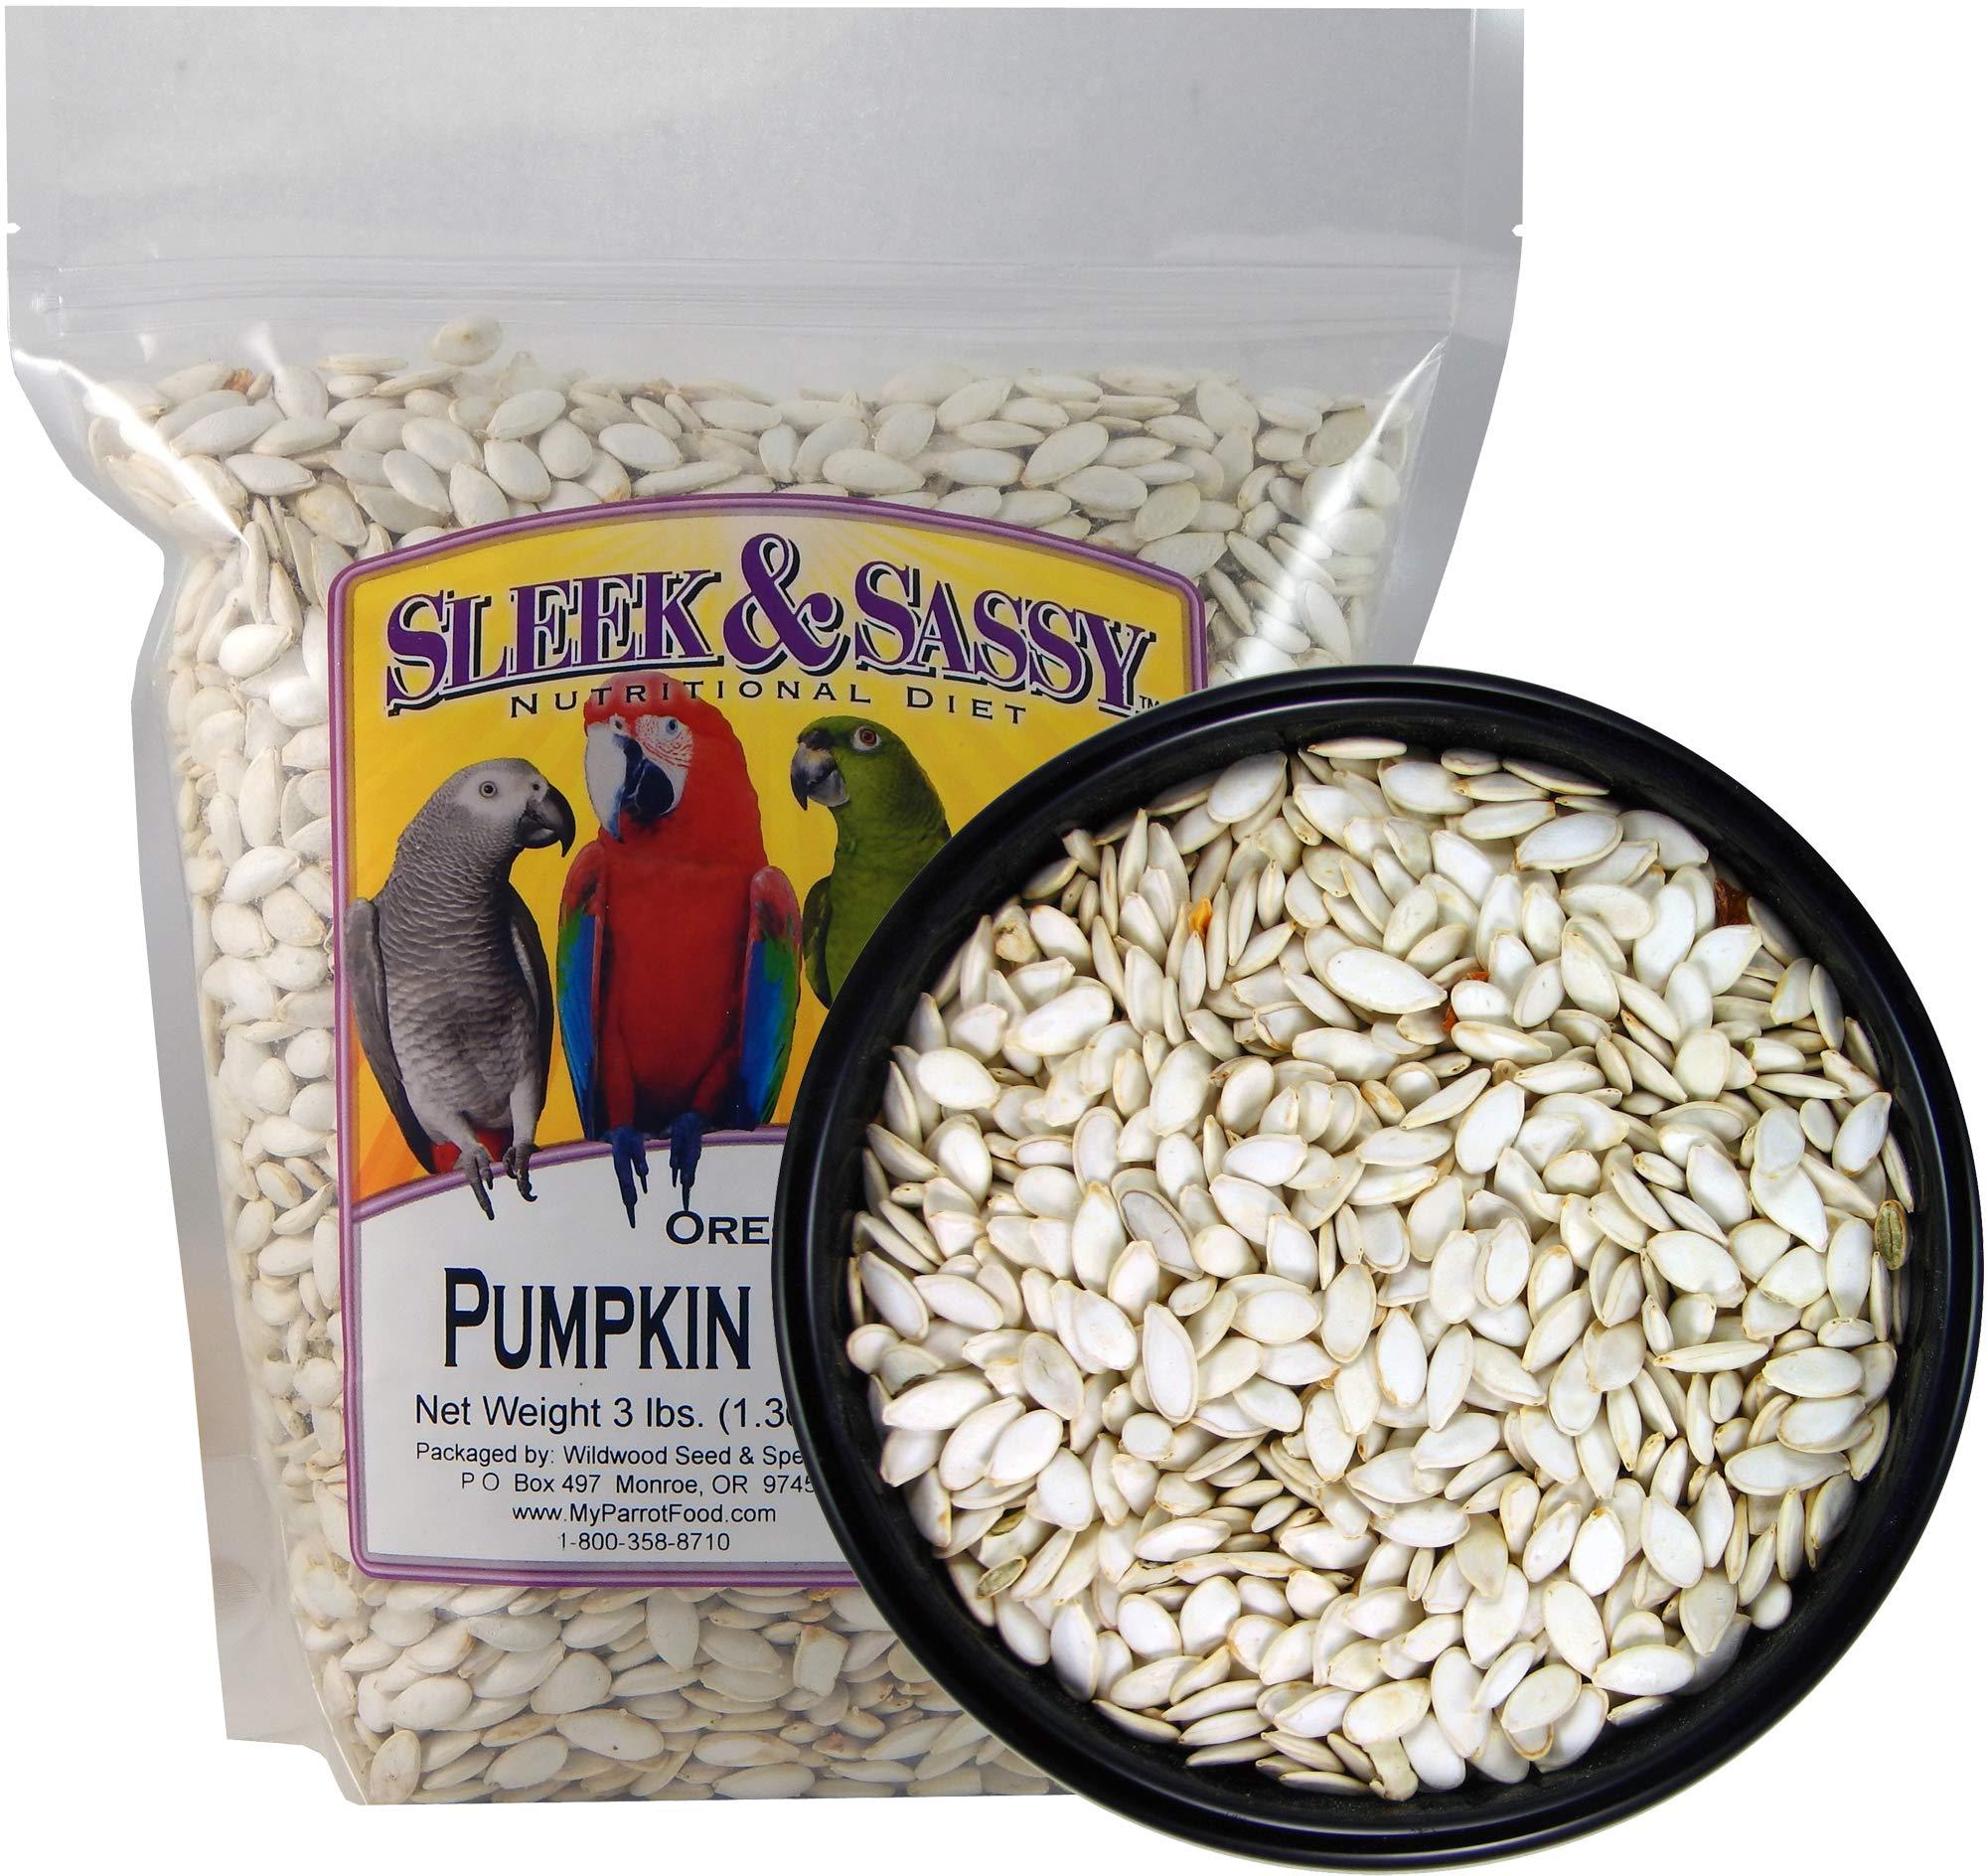 SLEEK & SASSY NUTRITIONAL DIET Oregon Squash (Pumpkin) Seeds Bird Treat (3 lbs.) by SLEEK & SASSY NUTRITIONAL DIET